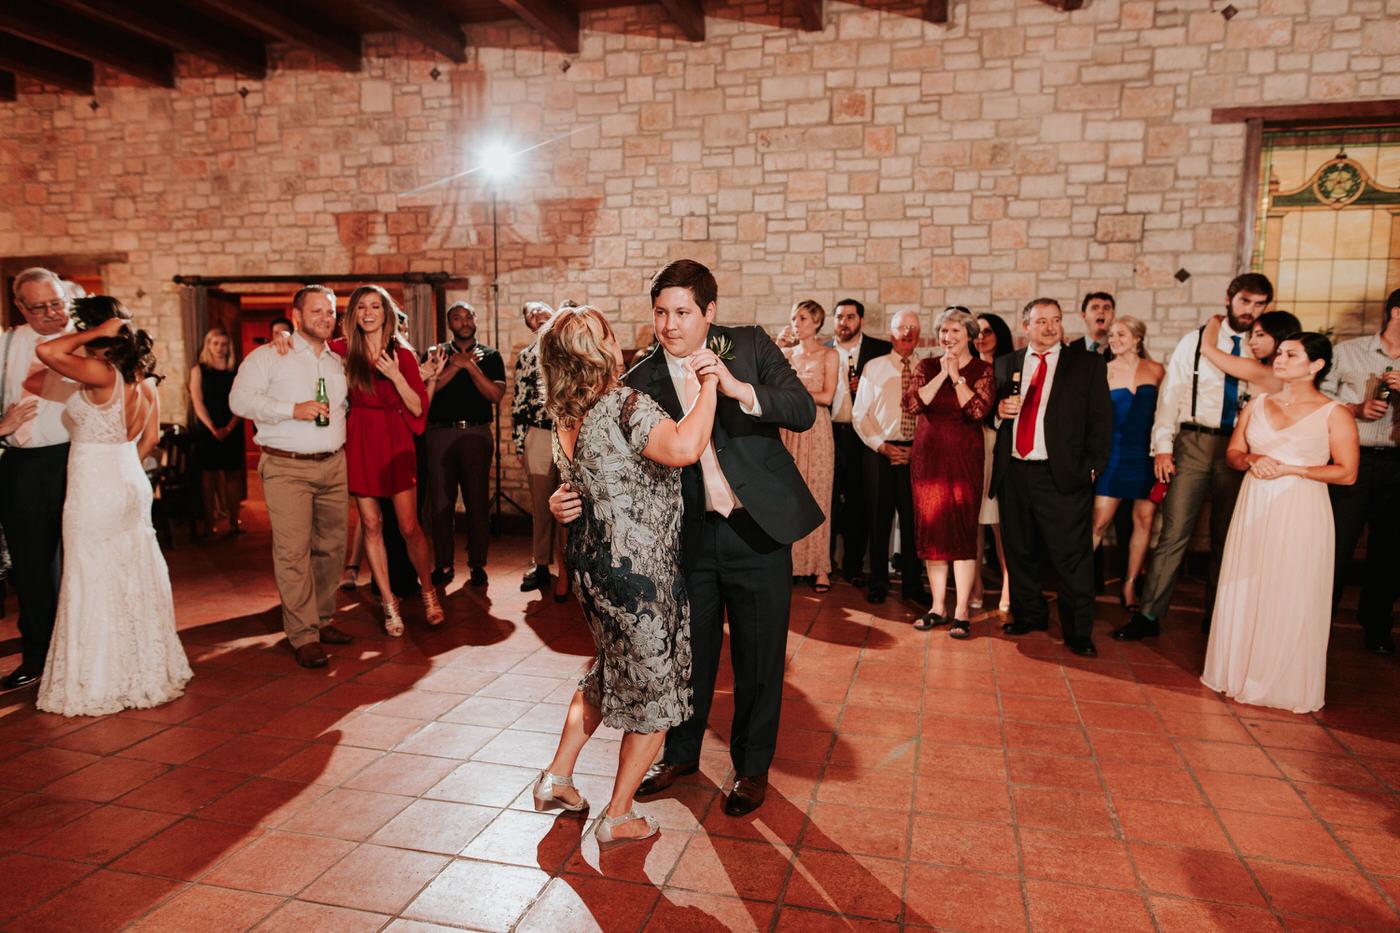 Wedding reception at Thurman's Mansion